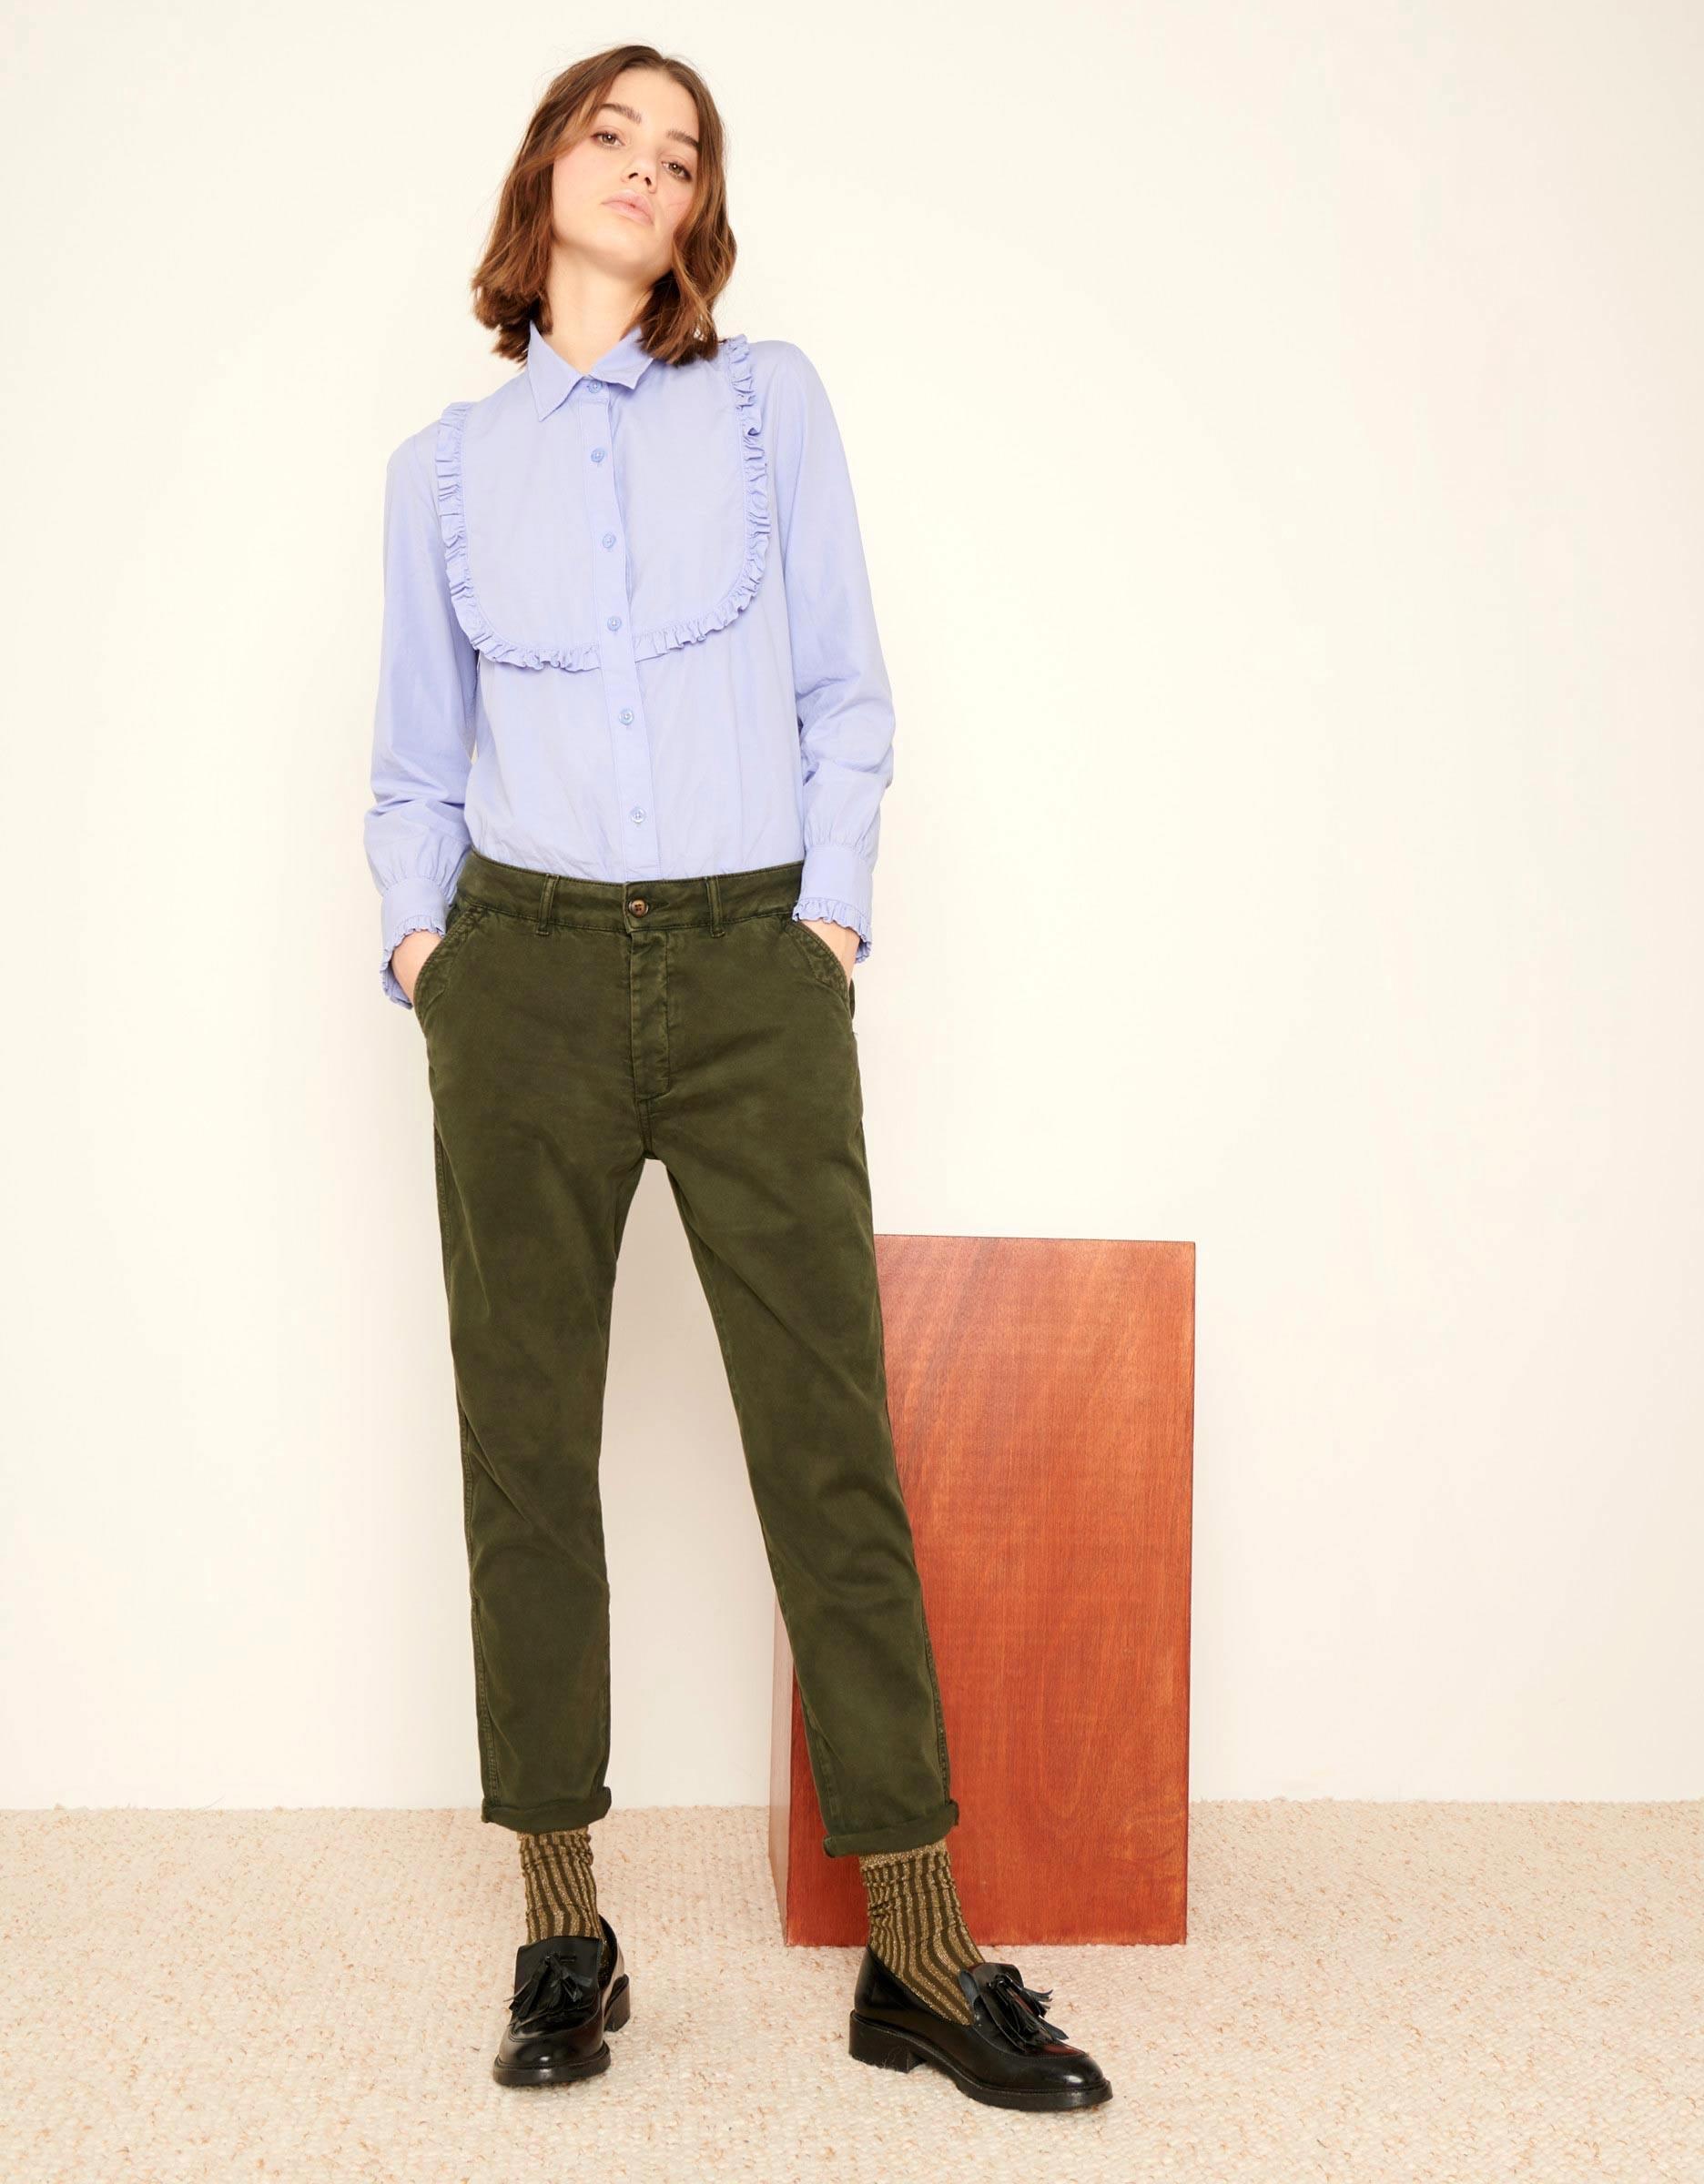 Chino Tapered Trousers Scott For Women Vert De Chrome Reiko